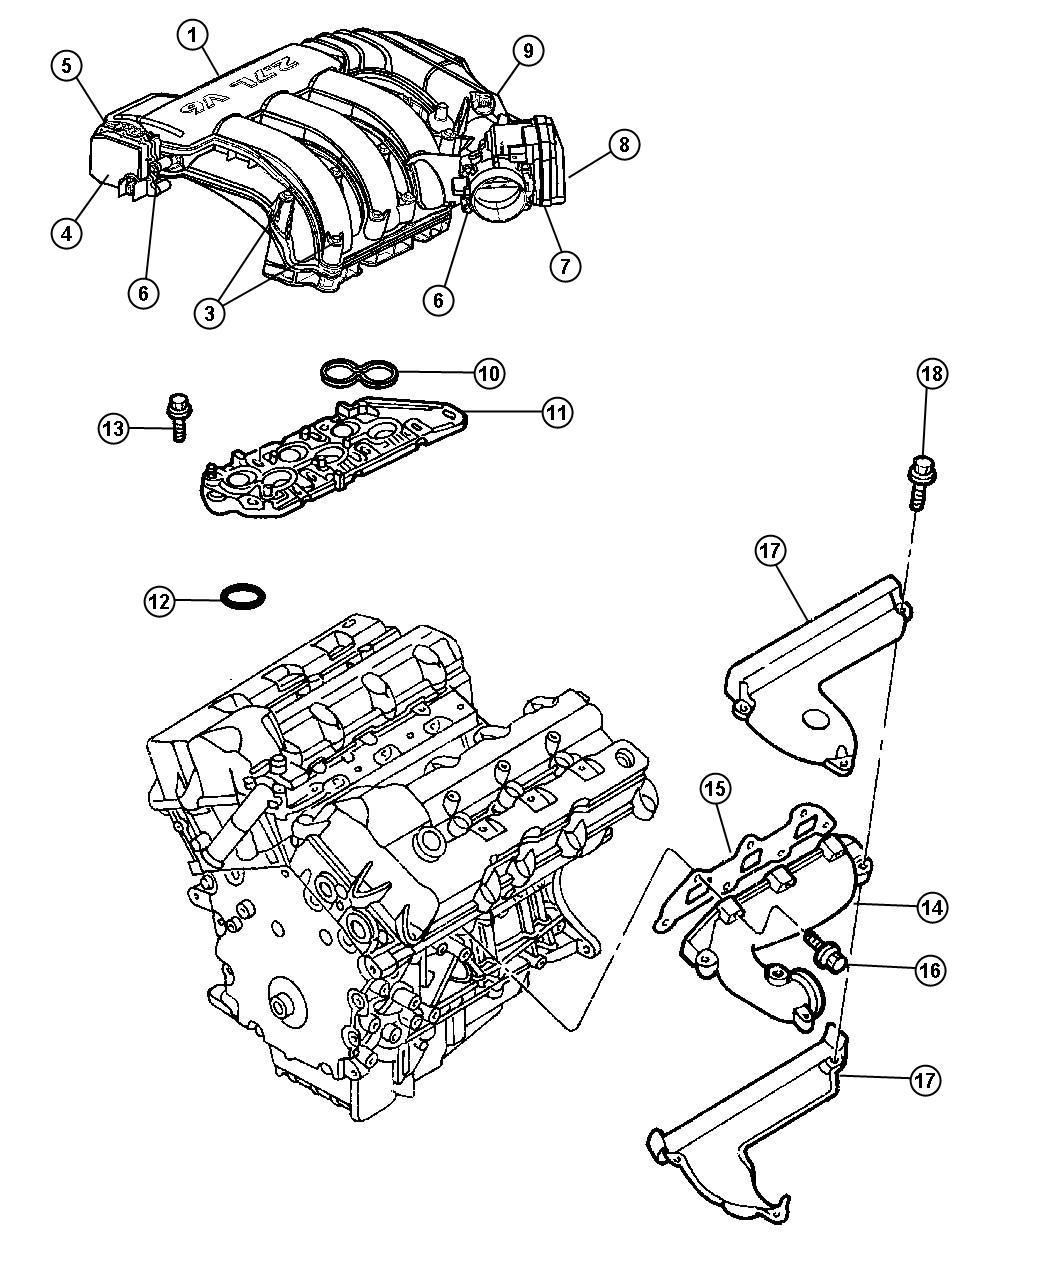 Chrysler 300 Engine Diagram